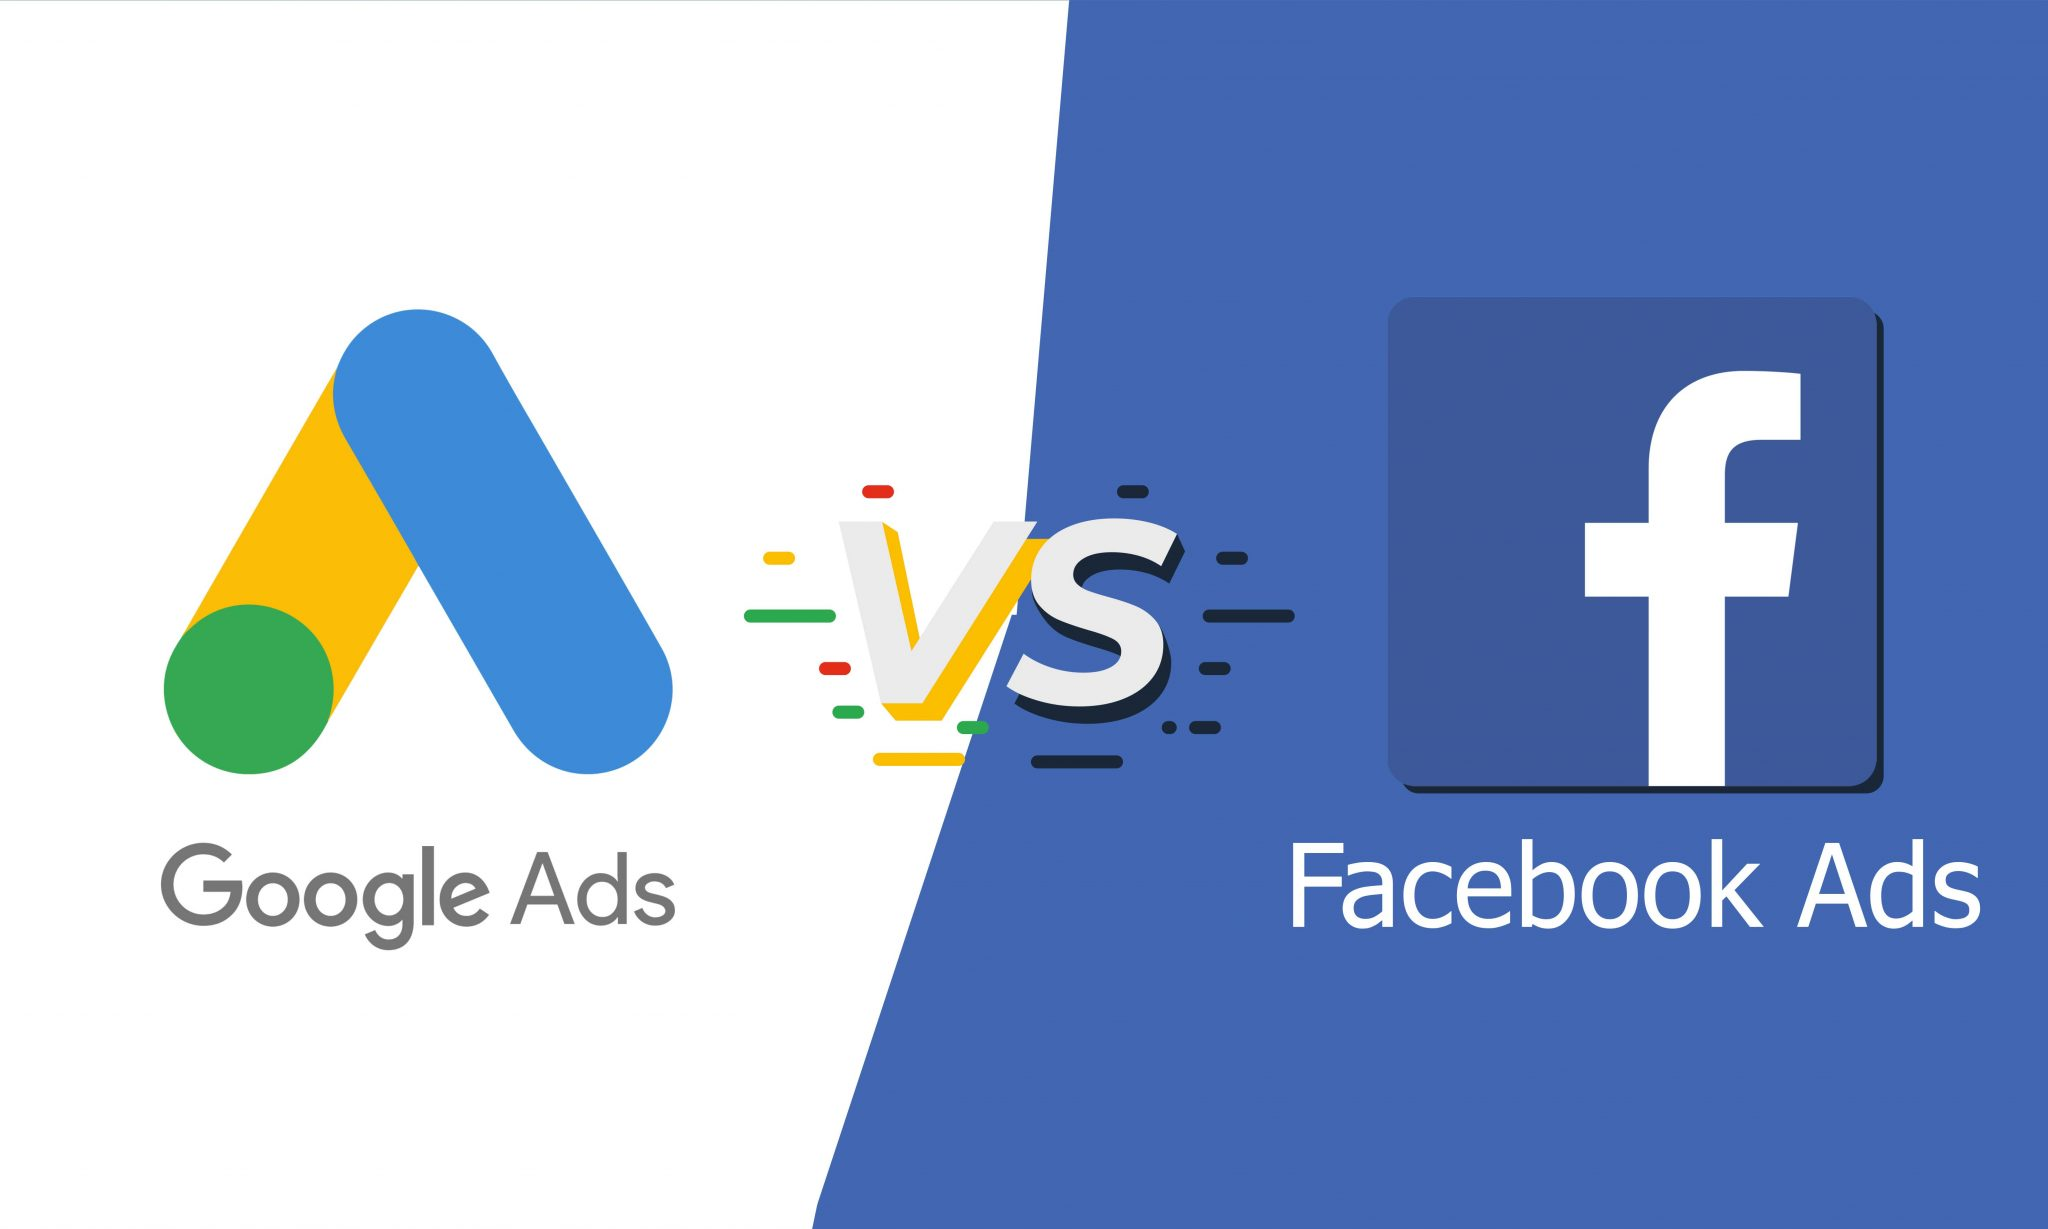 Facebook Ads o Google Ads : quale è meglio?